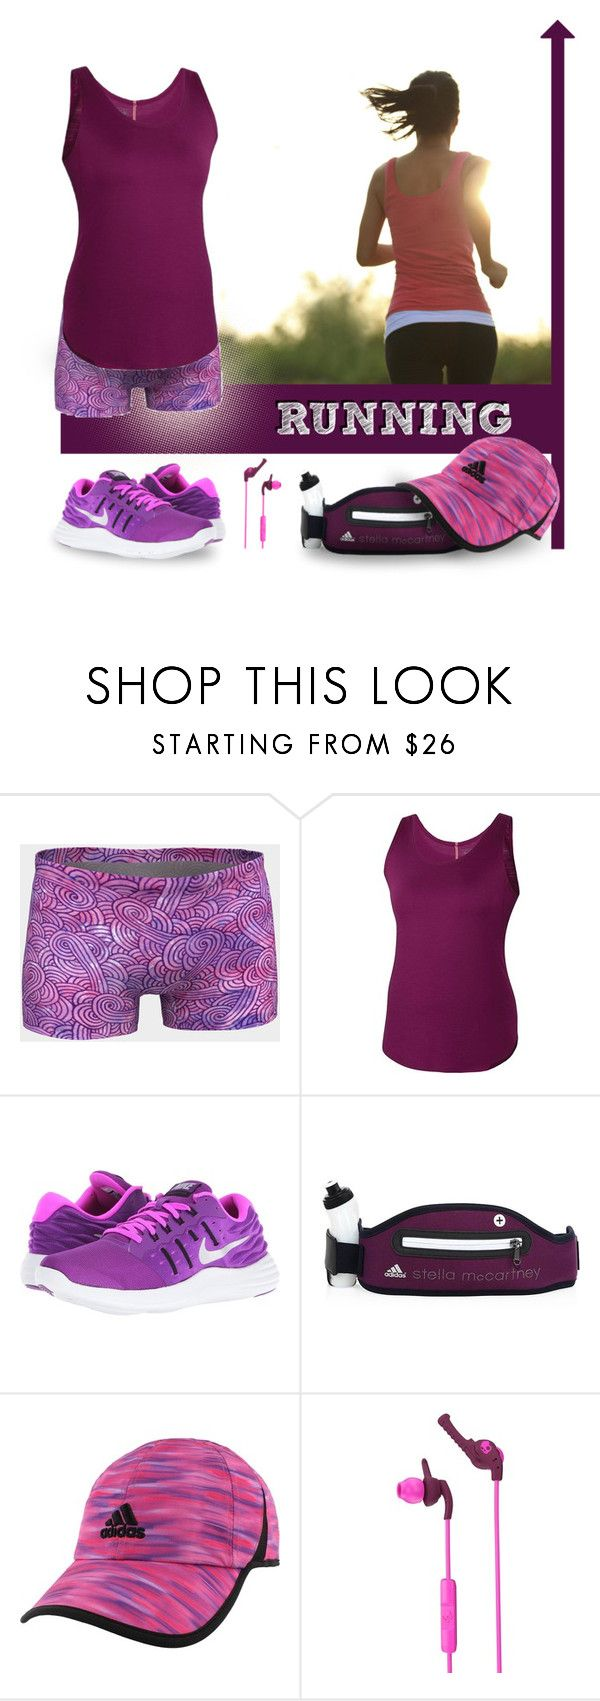 Running by @savousepate on @polyvore #pink #purple #sportwear